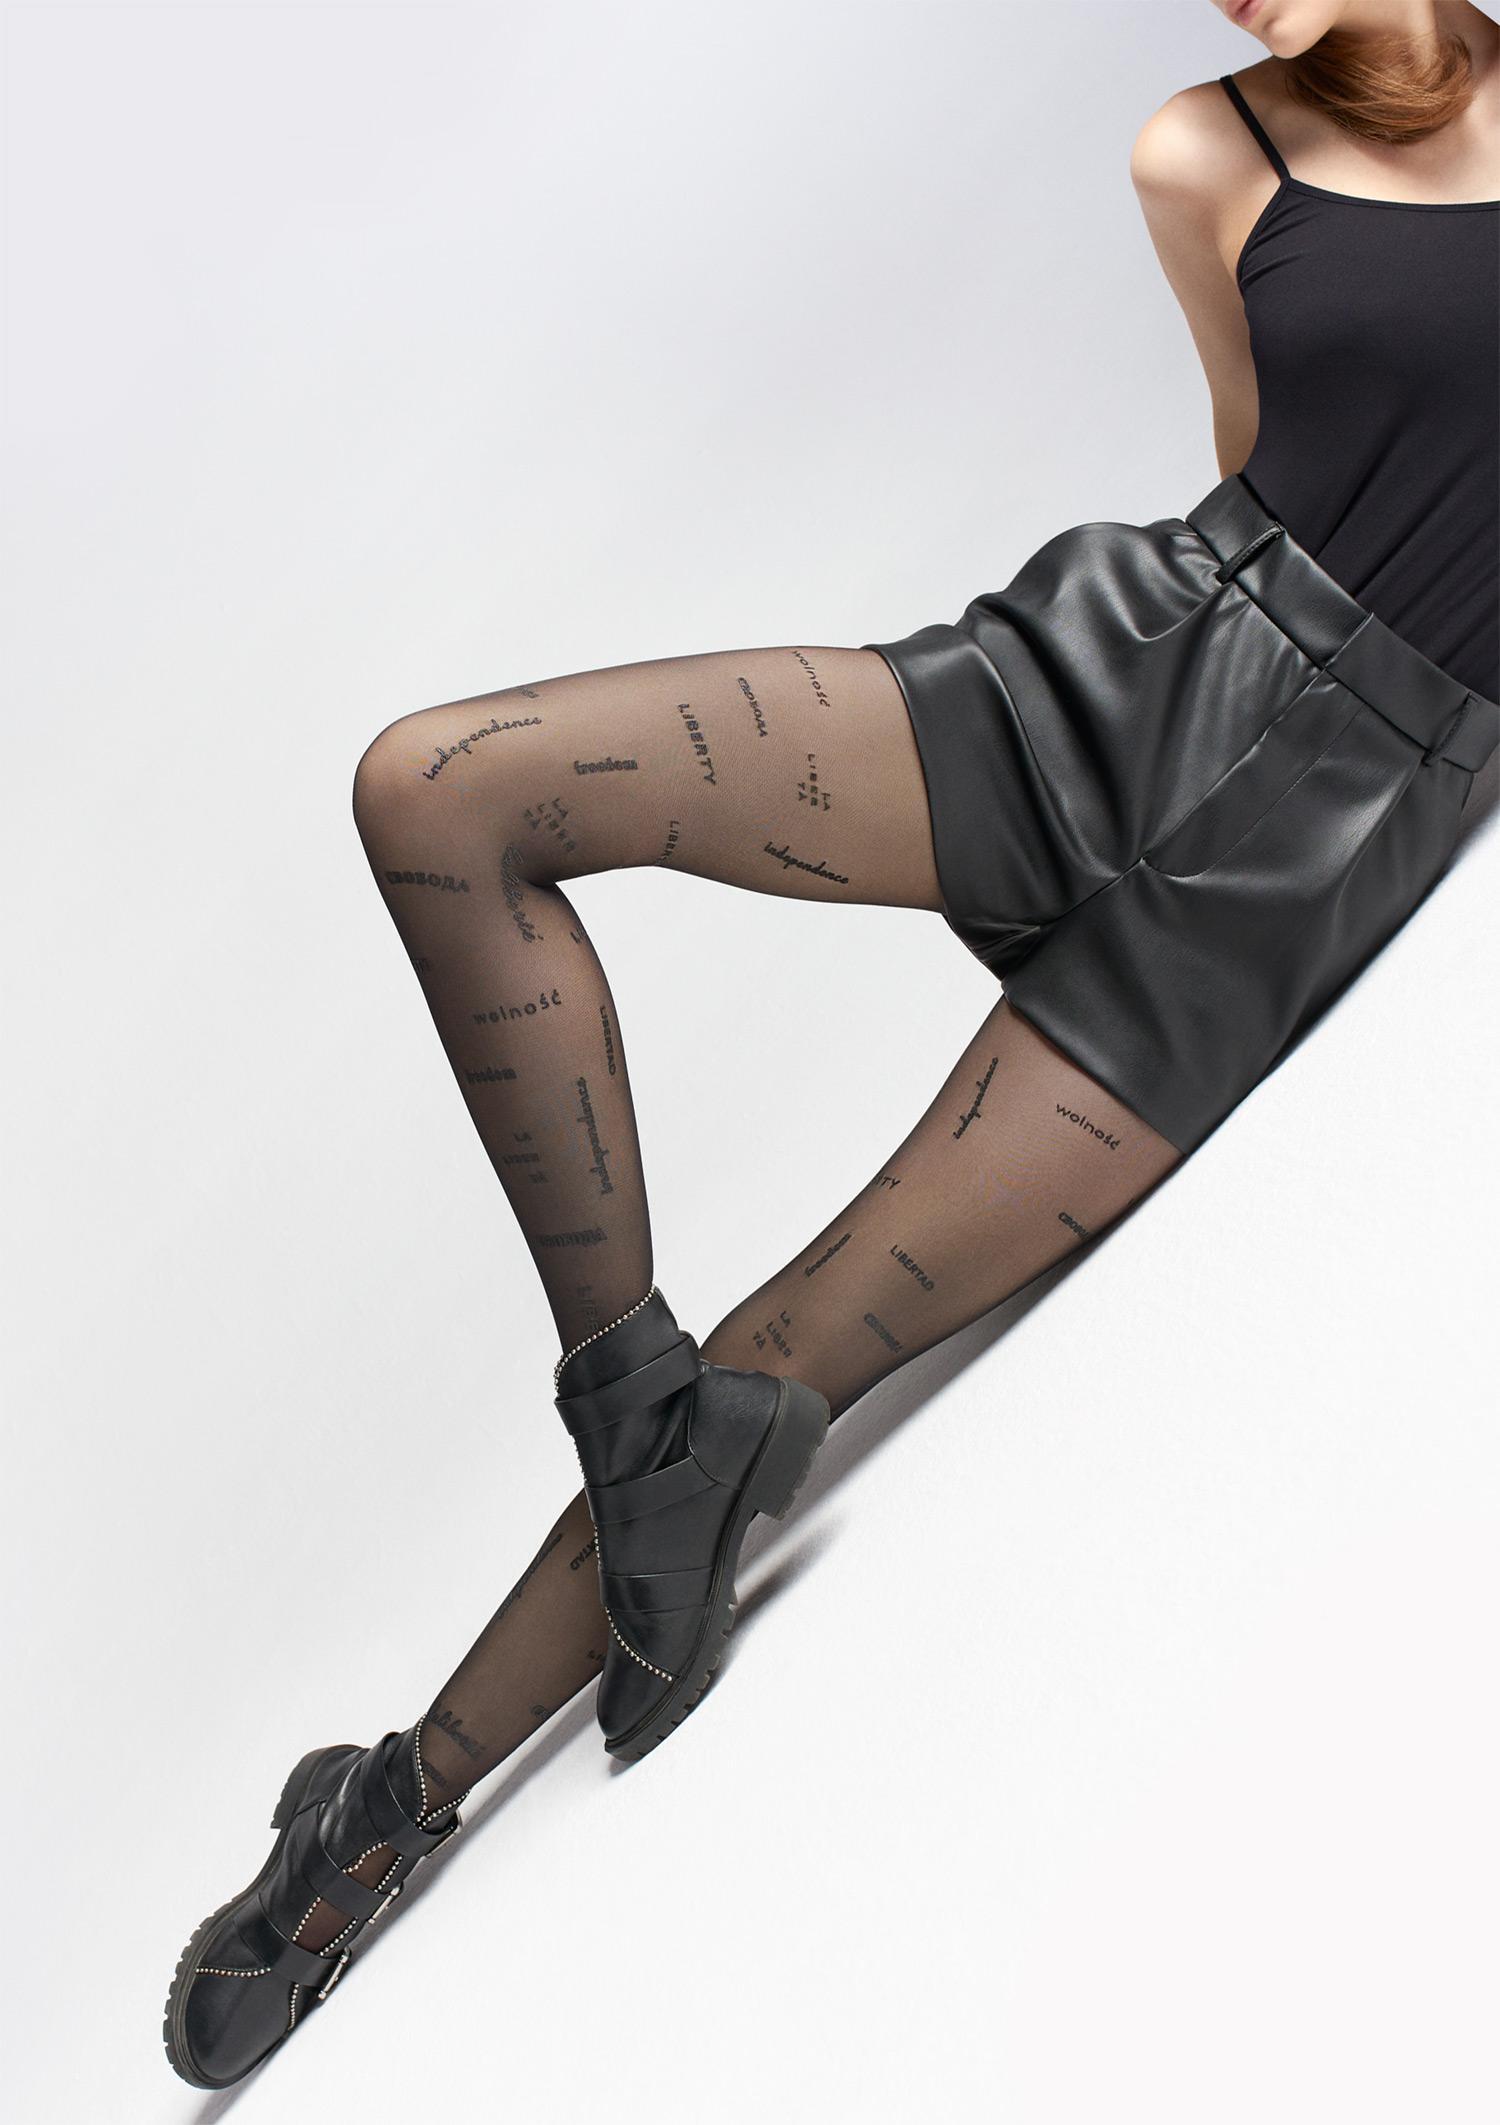 https://golden-legs.com.ua/images/stories/virtuemart/product/cienkie-rajstopy-w-napisy-liberty-w10-marilyn_5.jpg